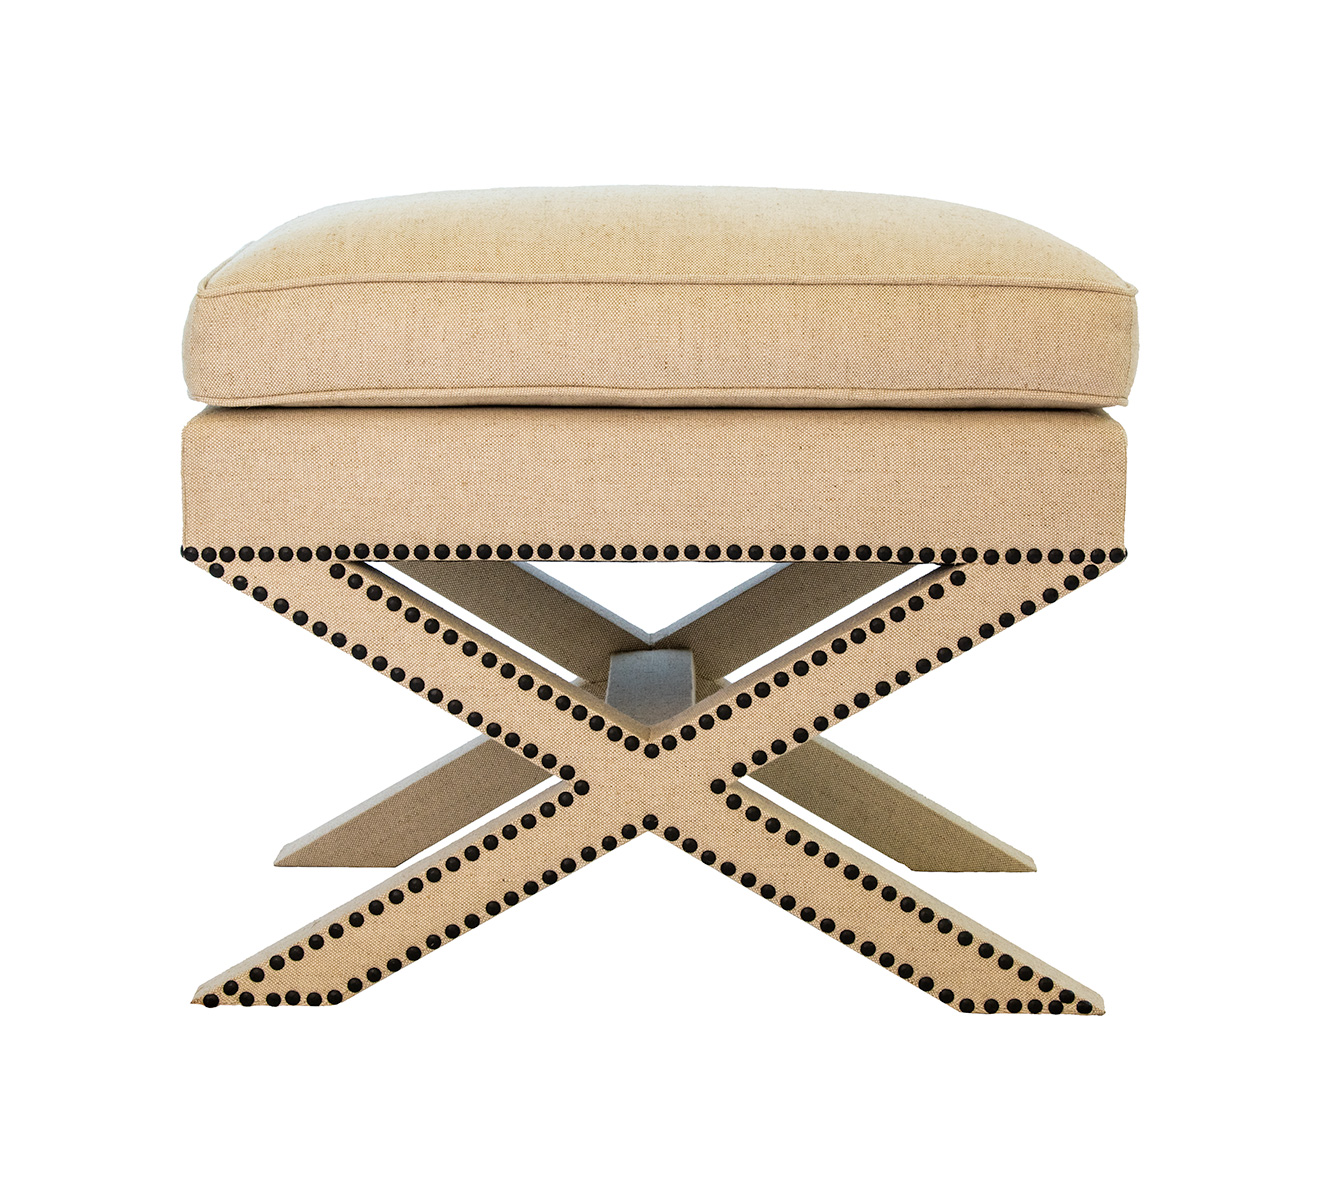 x_bench_cushion_cream_side